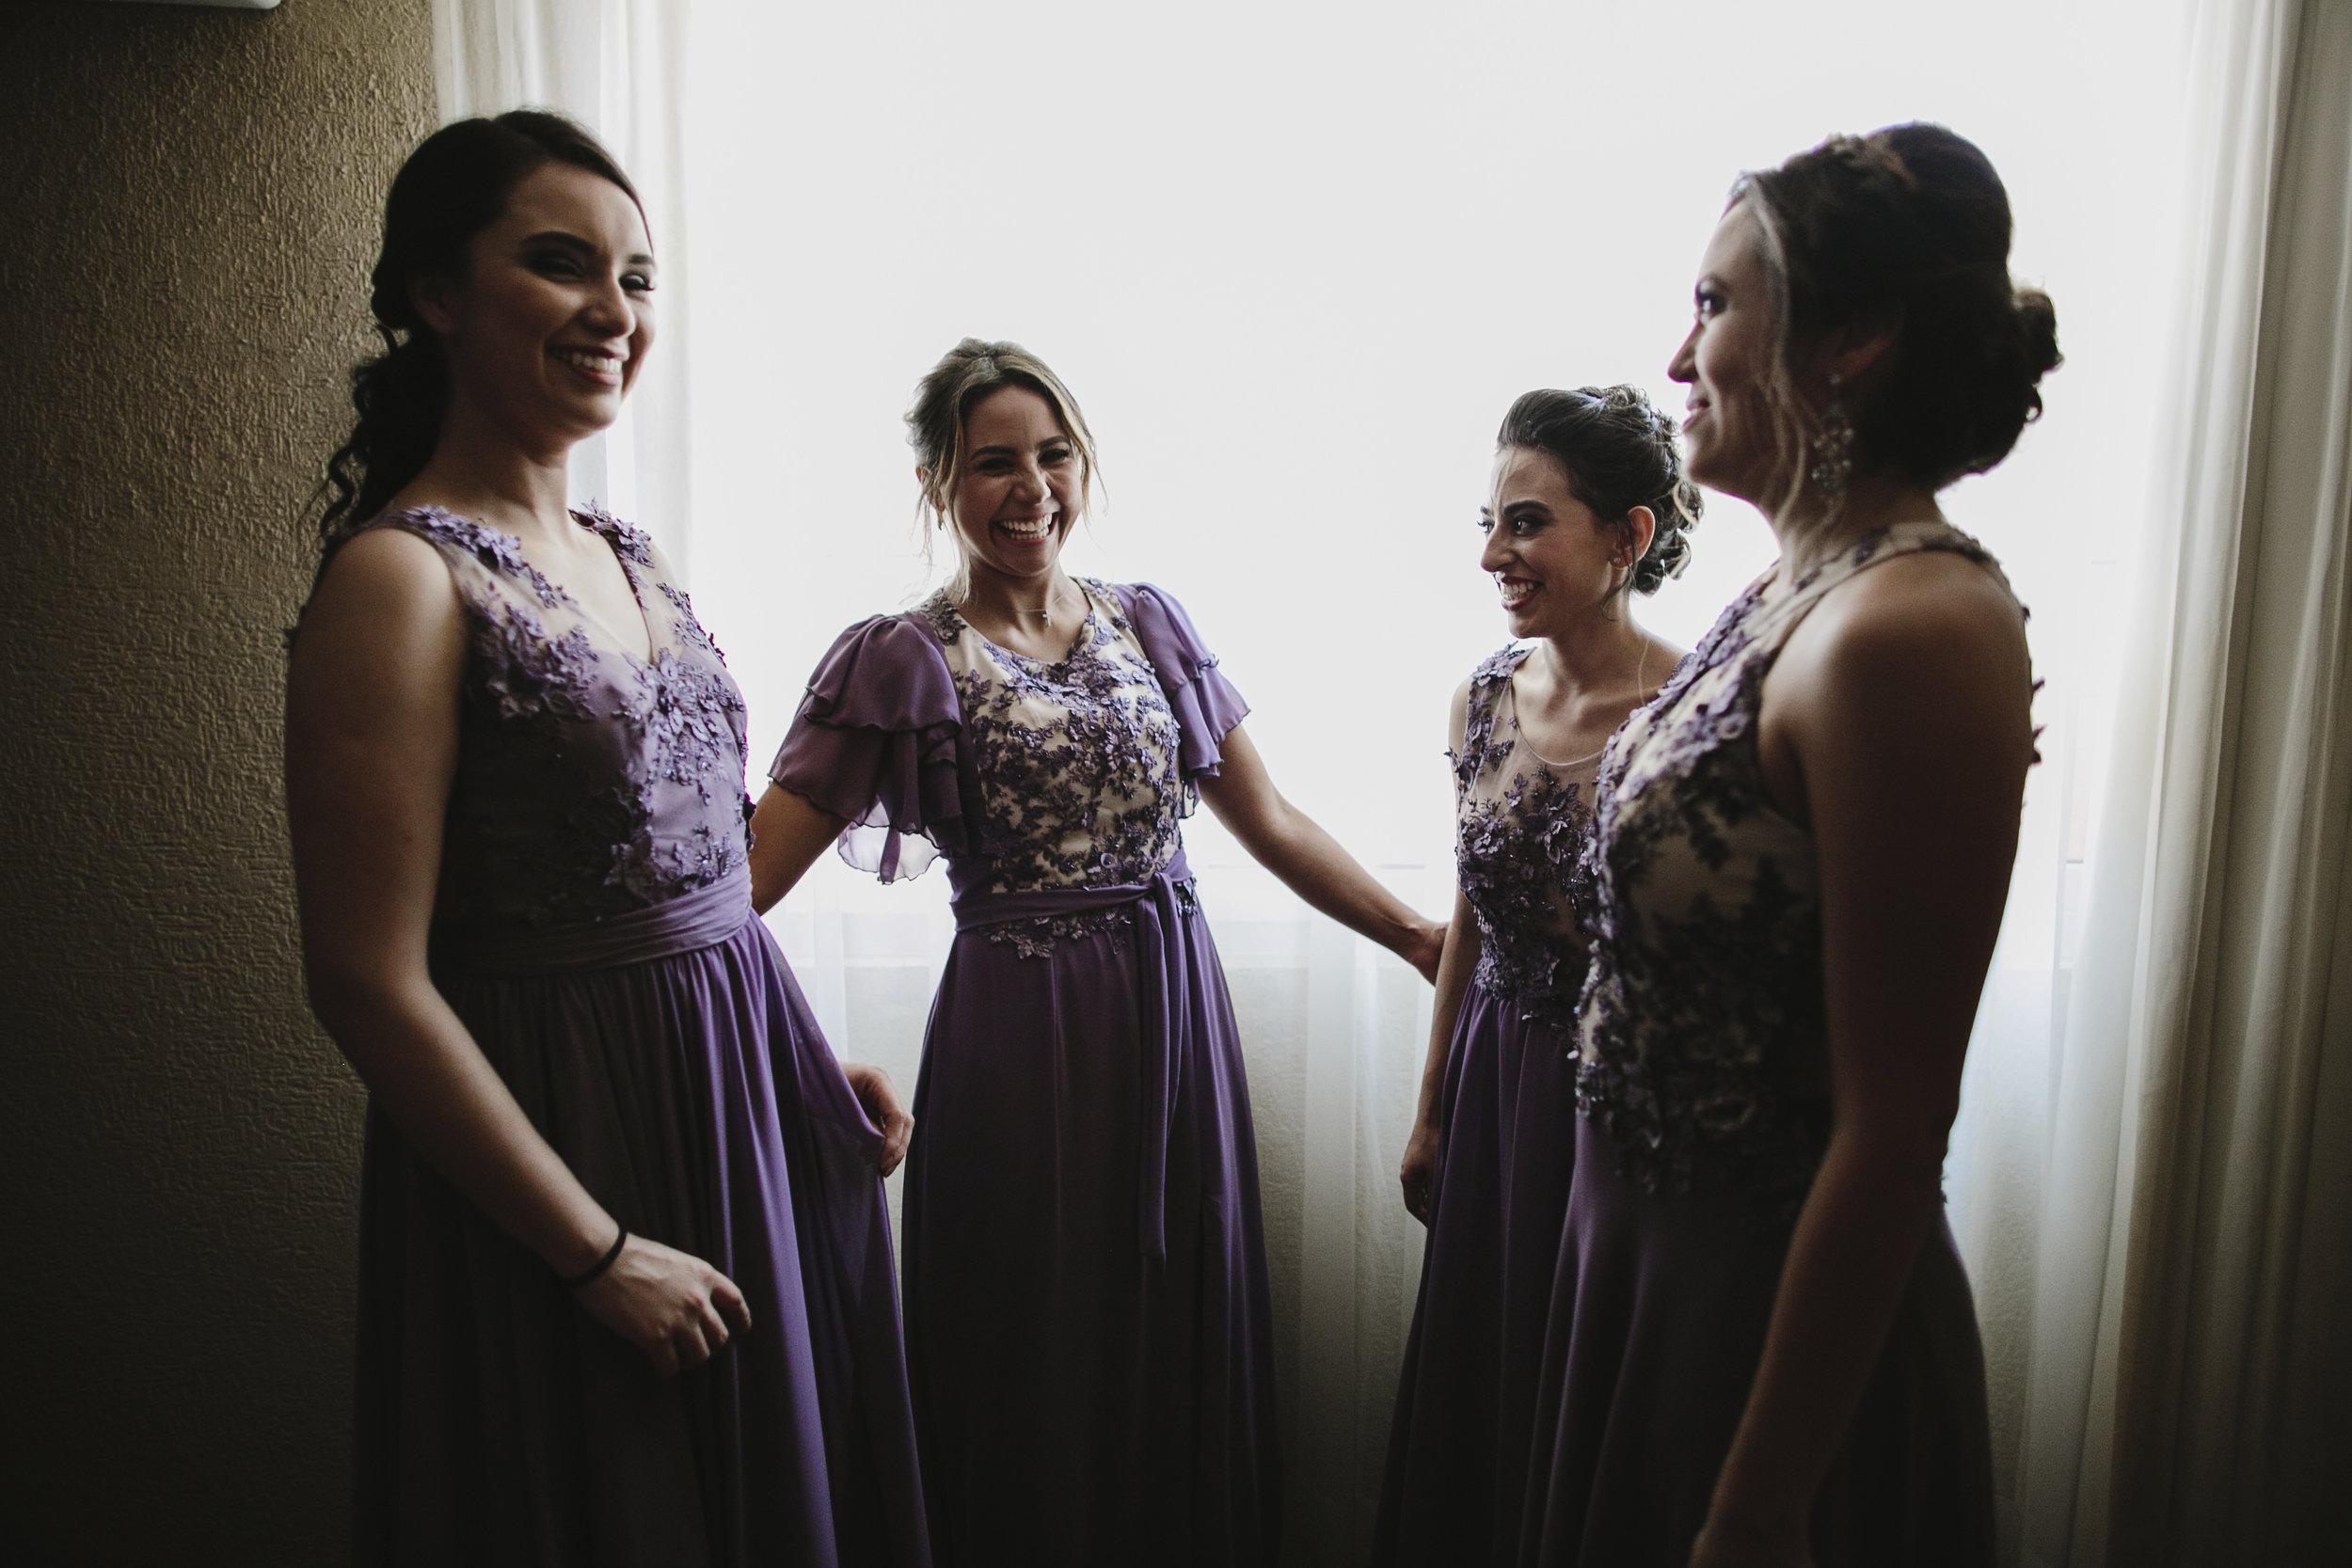 alfons_flores_destination_wedding_photography_mavi_david-676.JPG